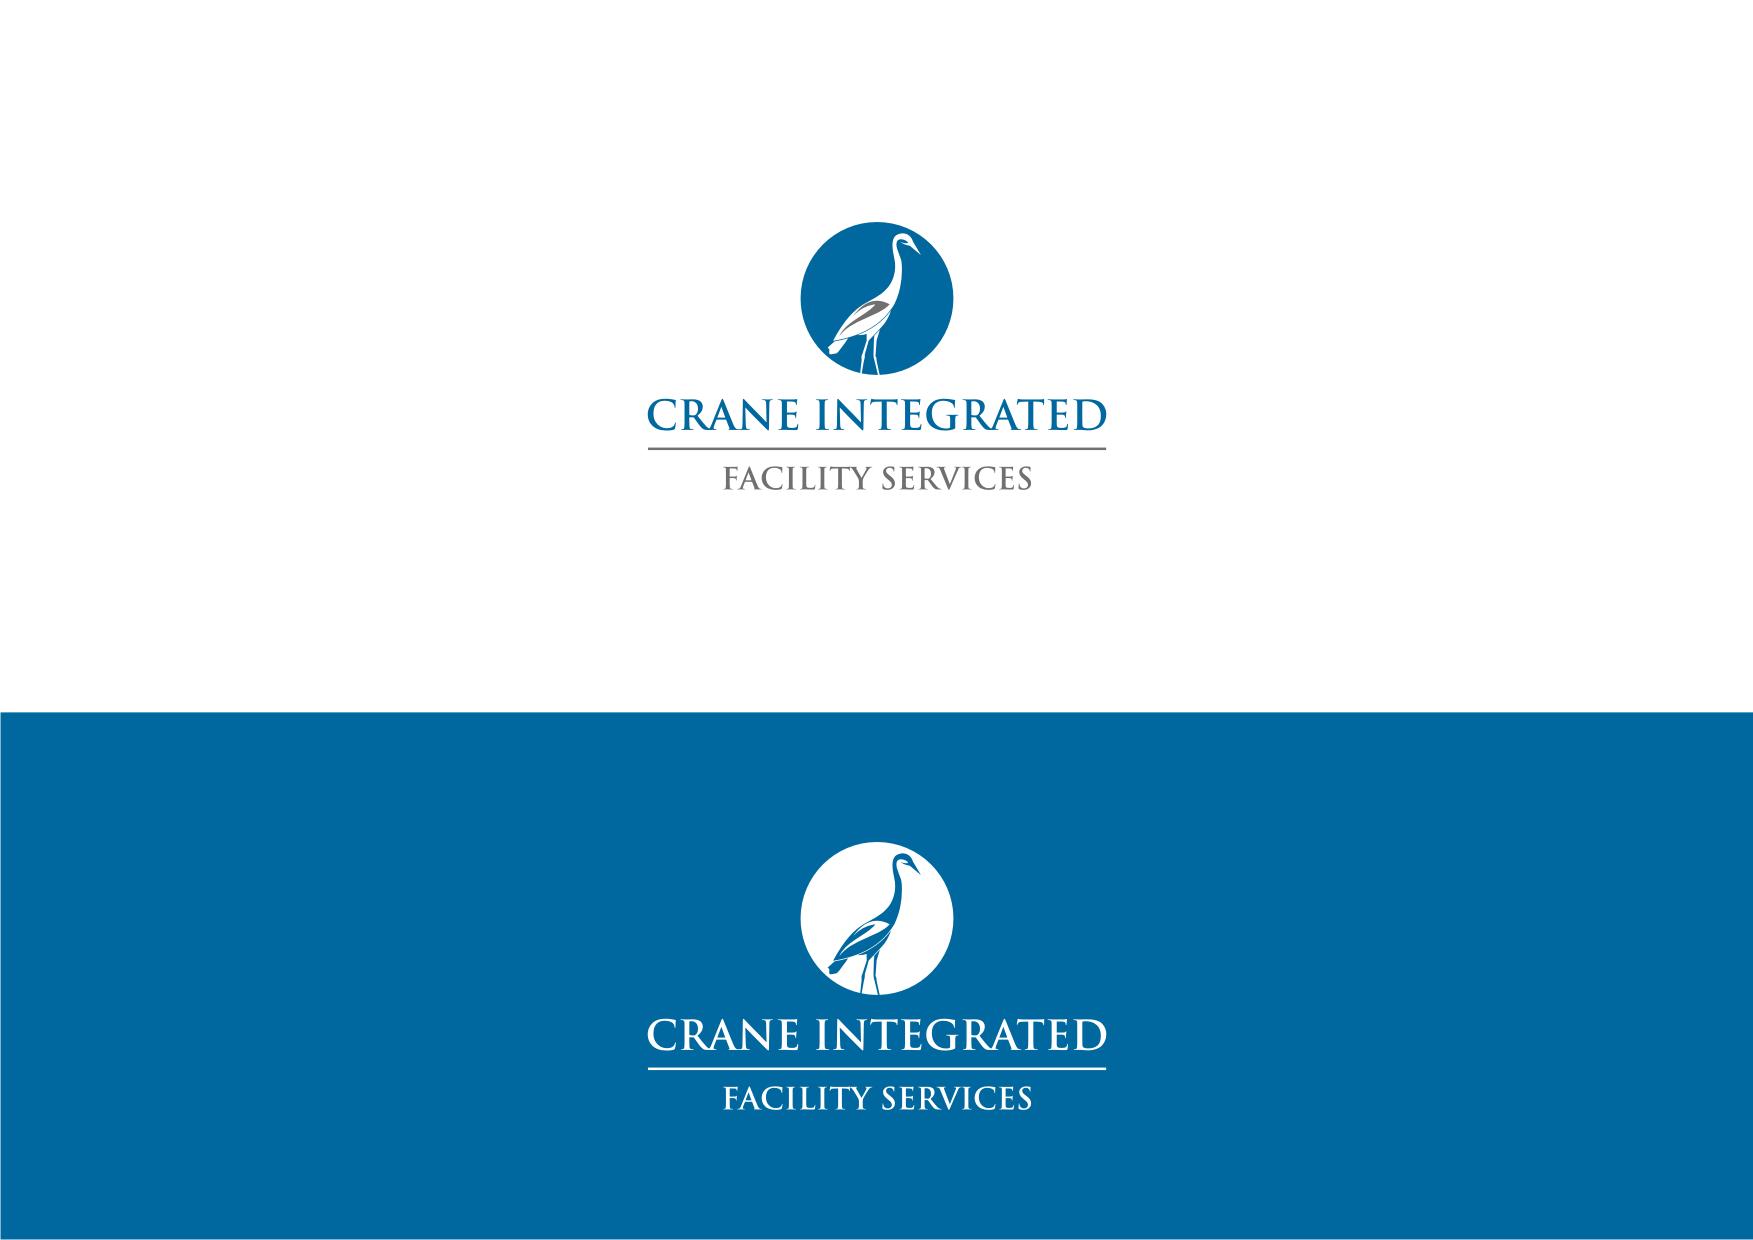 Logo Design by Sigitumarali Sigit - Entry No. 93 in the Logo Design Contest Inspiring Logo Design for Crane Integrated Facility Services.